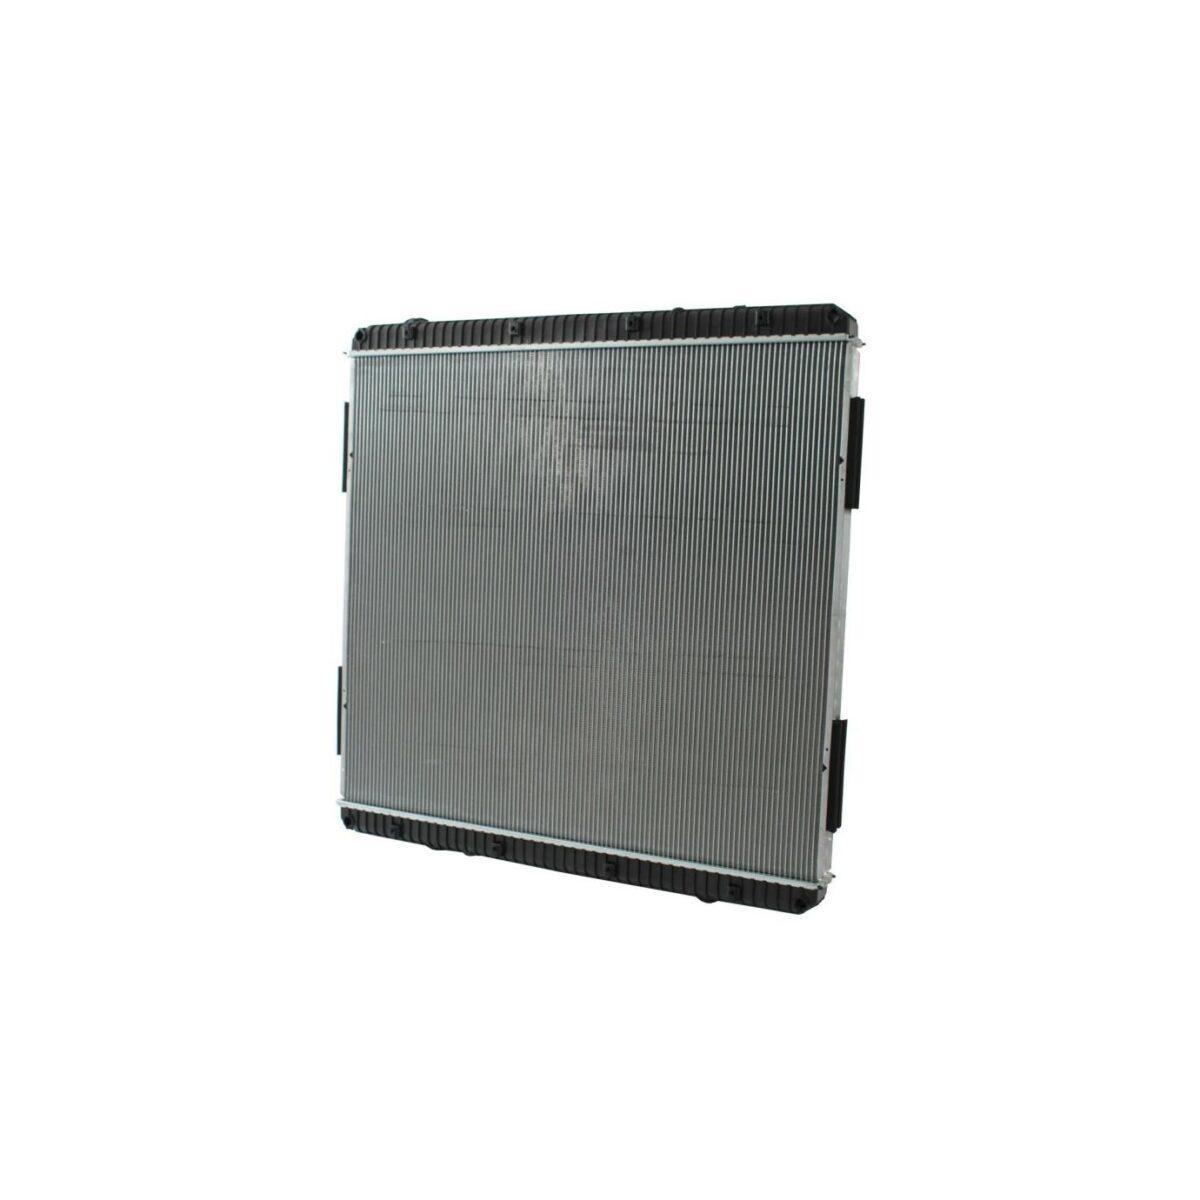 western star 4900 10 15 radiator oem 529622001